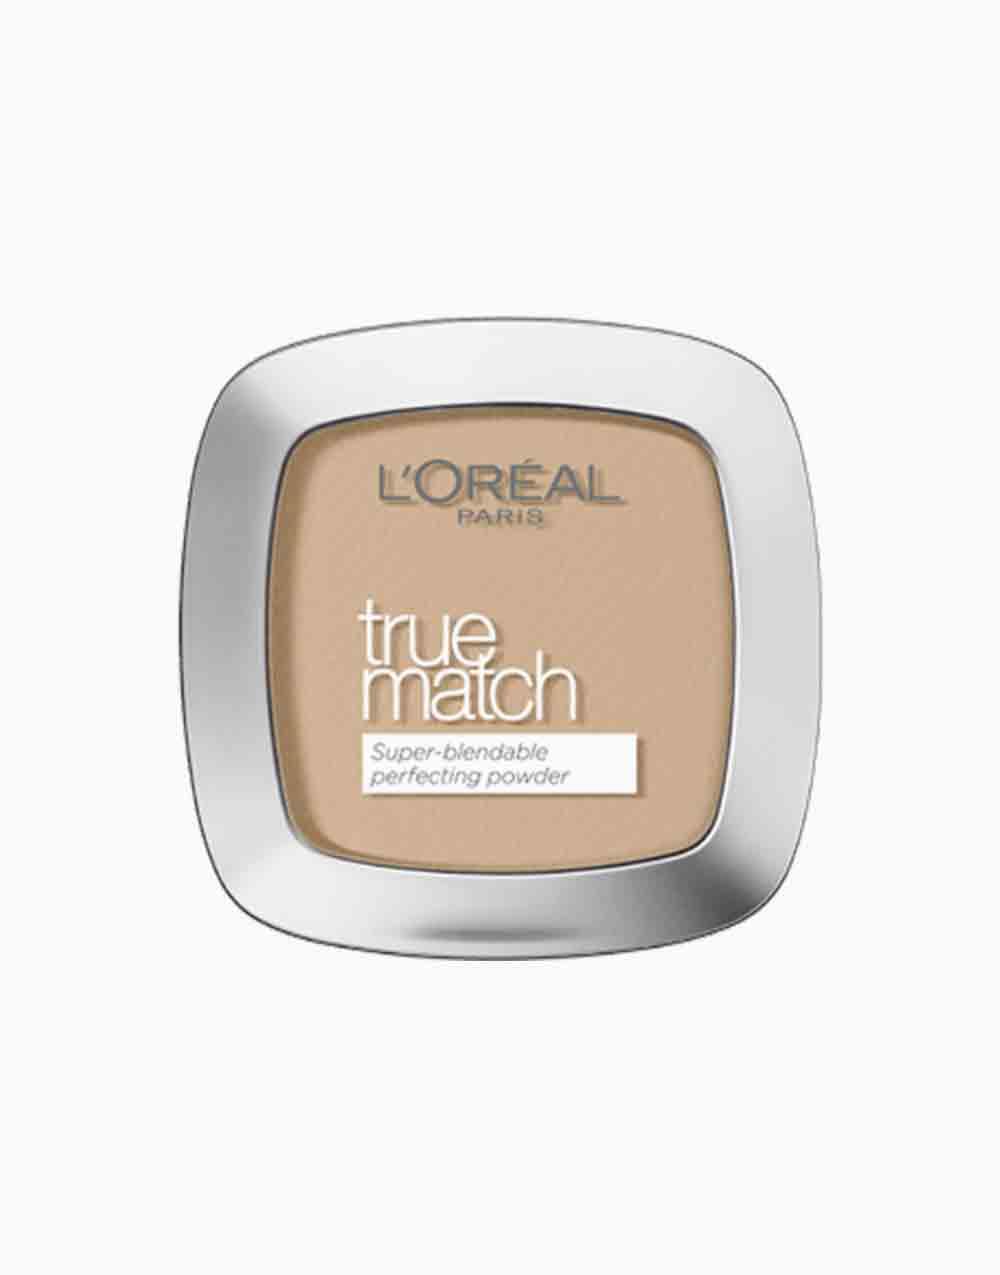 True Match Skin-Caring Skin-Matching Pressed Powder by L'Oréal Paris | 4N Beige